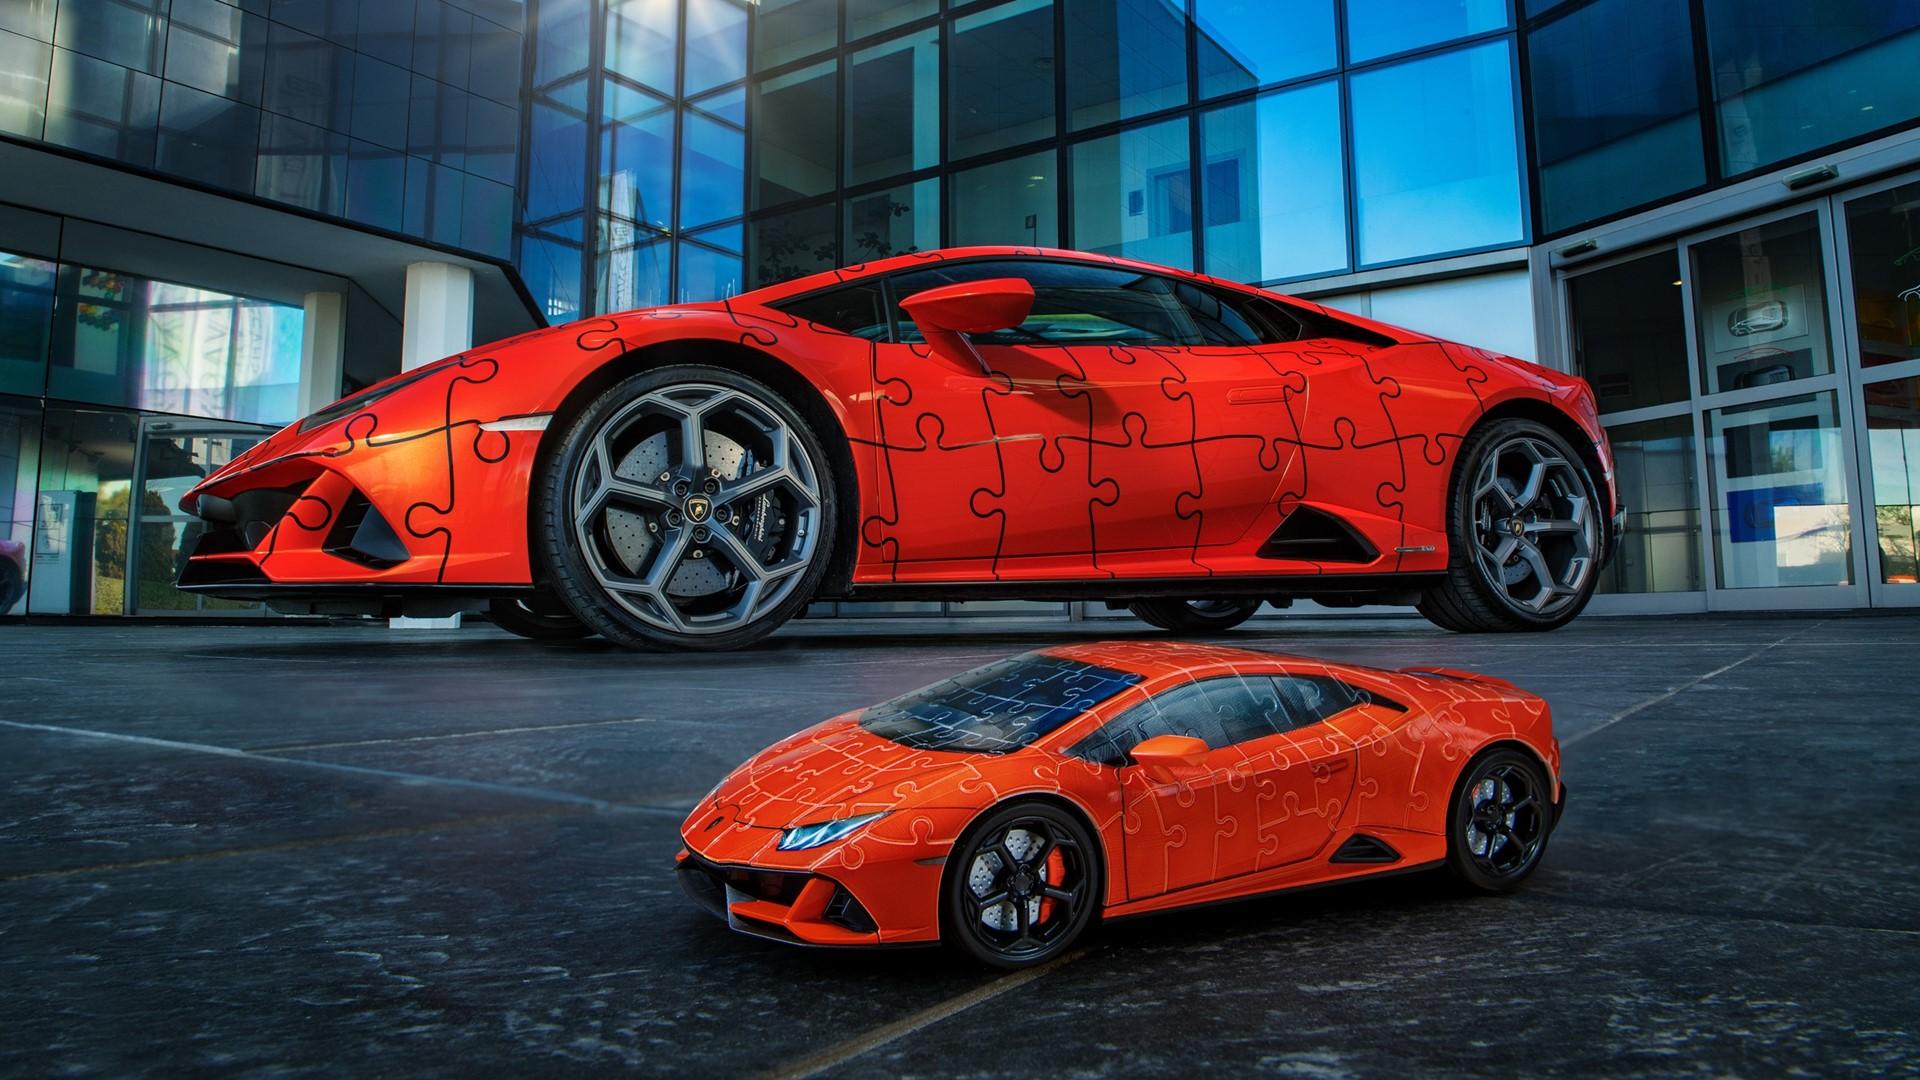 The Lamborghini Huracán EVO: build a super sports car in a 3D jigsaw puzzle - Image 3